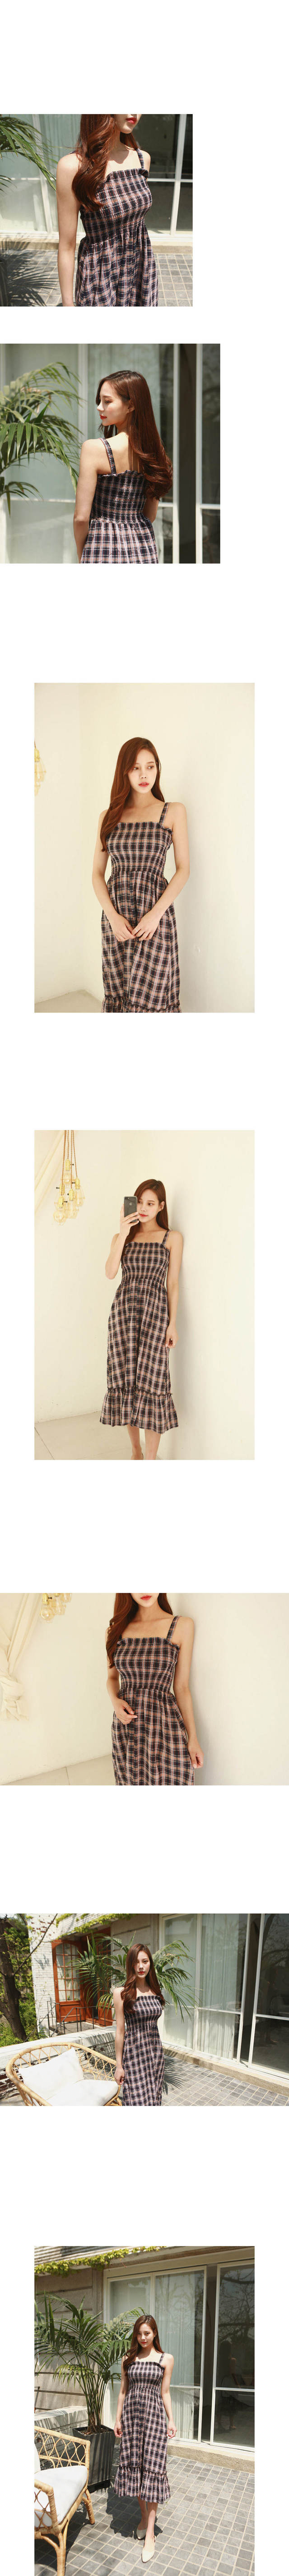 Check smoked long dress